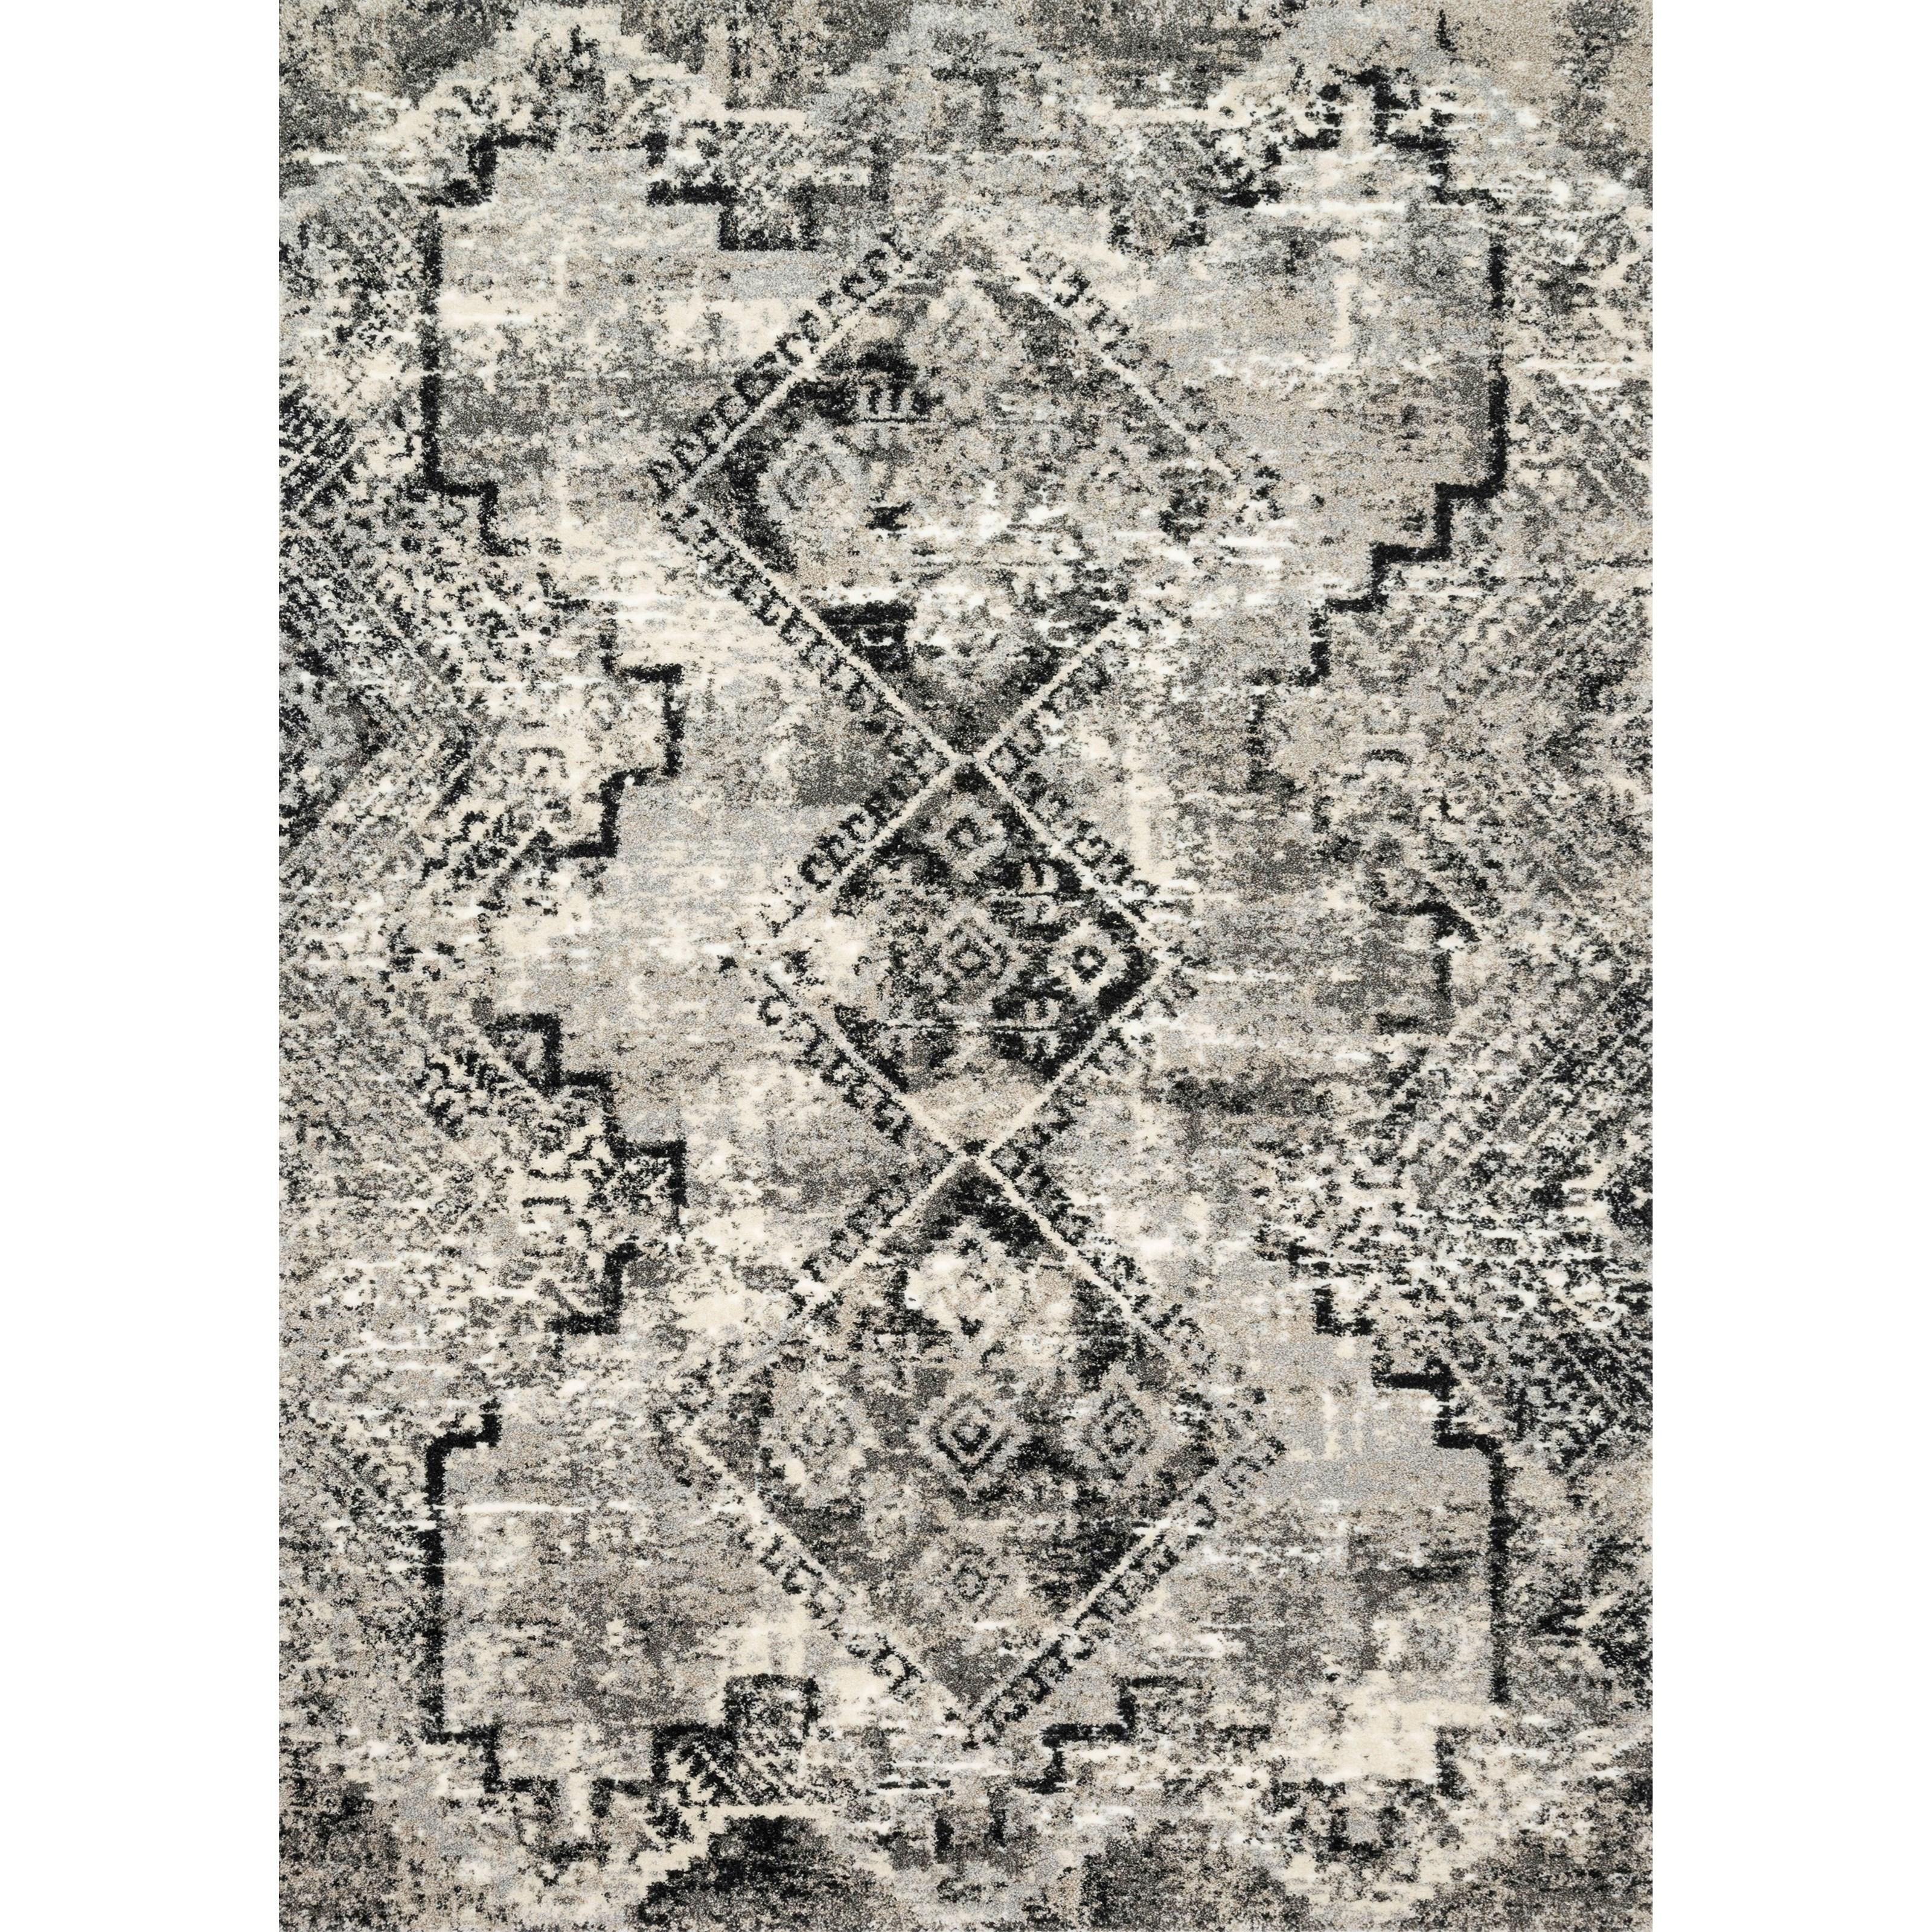 "Viera 8'11"" x 12'5"" Grey / Black Rug by Loloi Rugs at Pedigo Furniture"